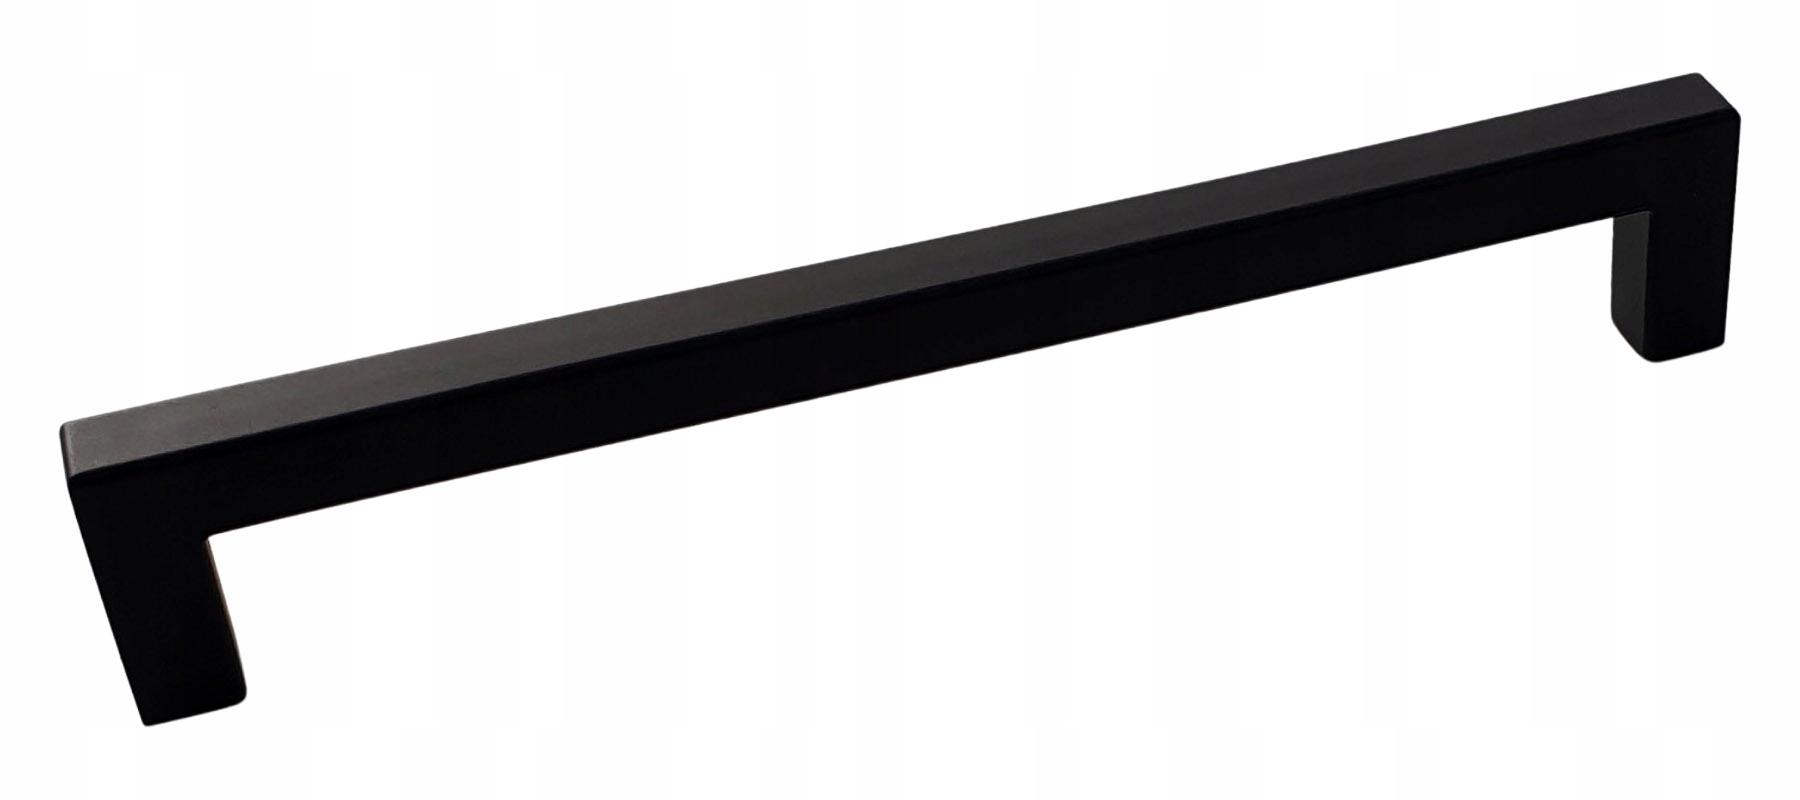 Ручка мебельная Square 160мм чёрная матовая + винты